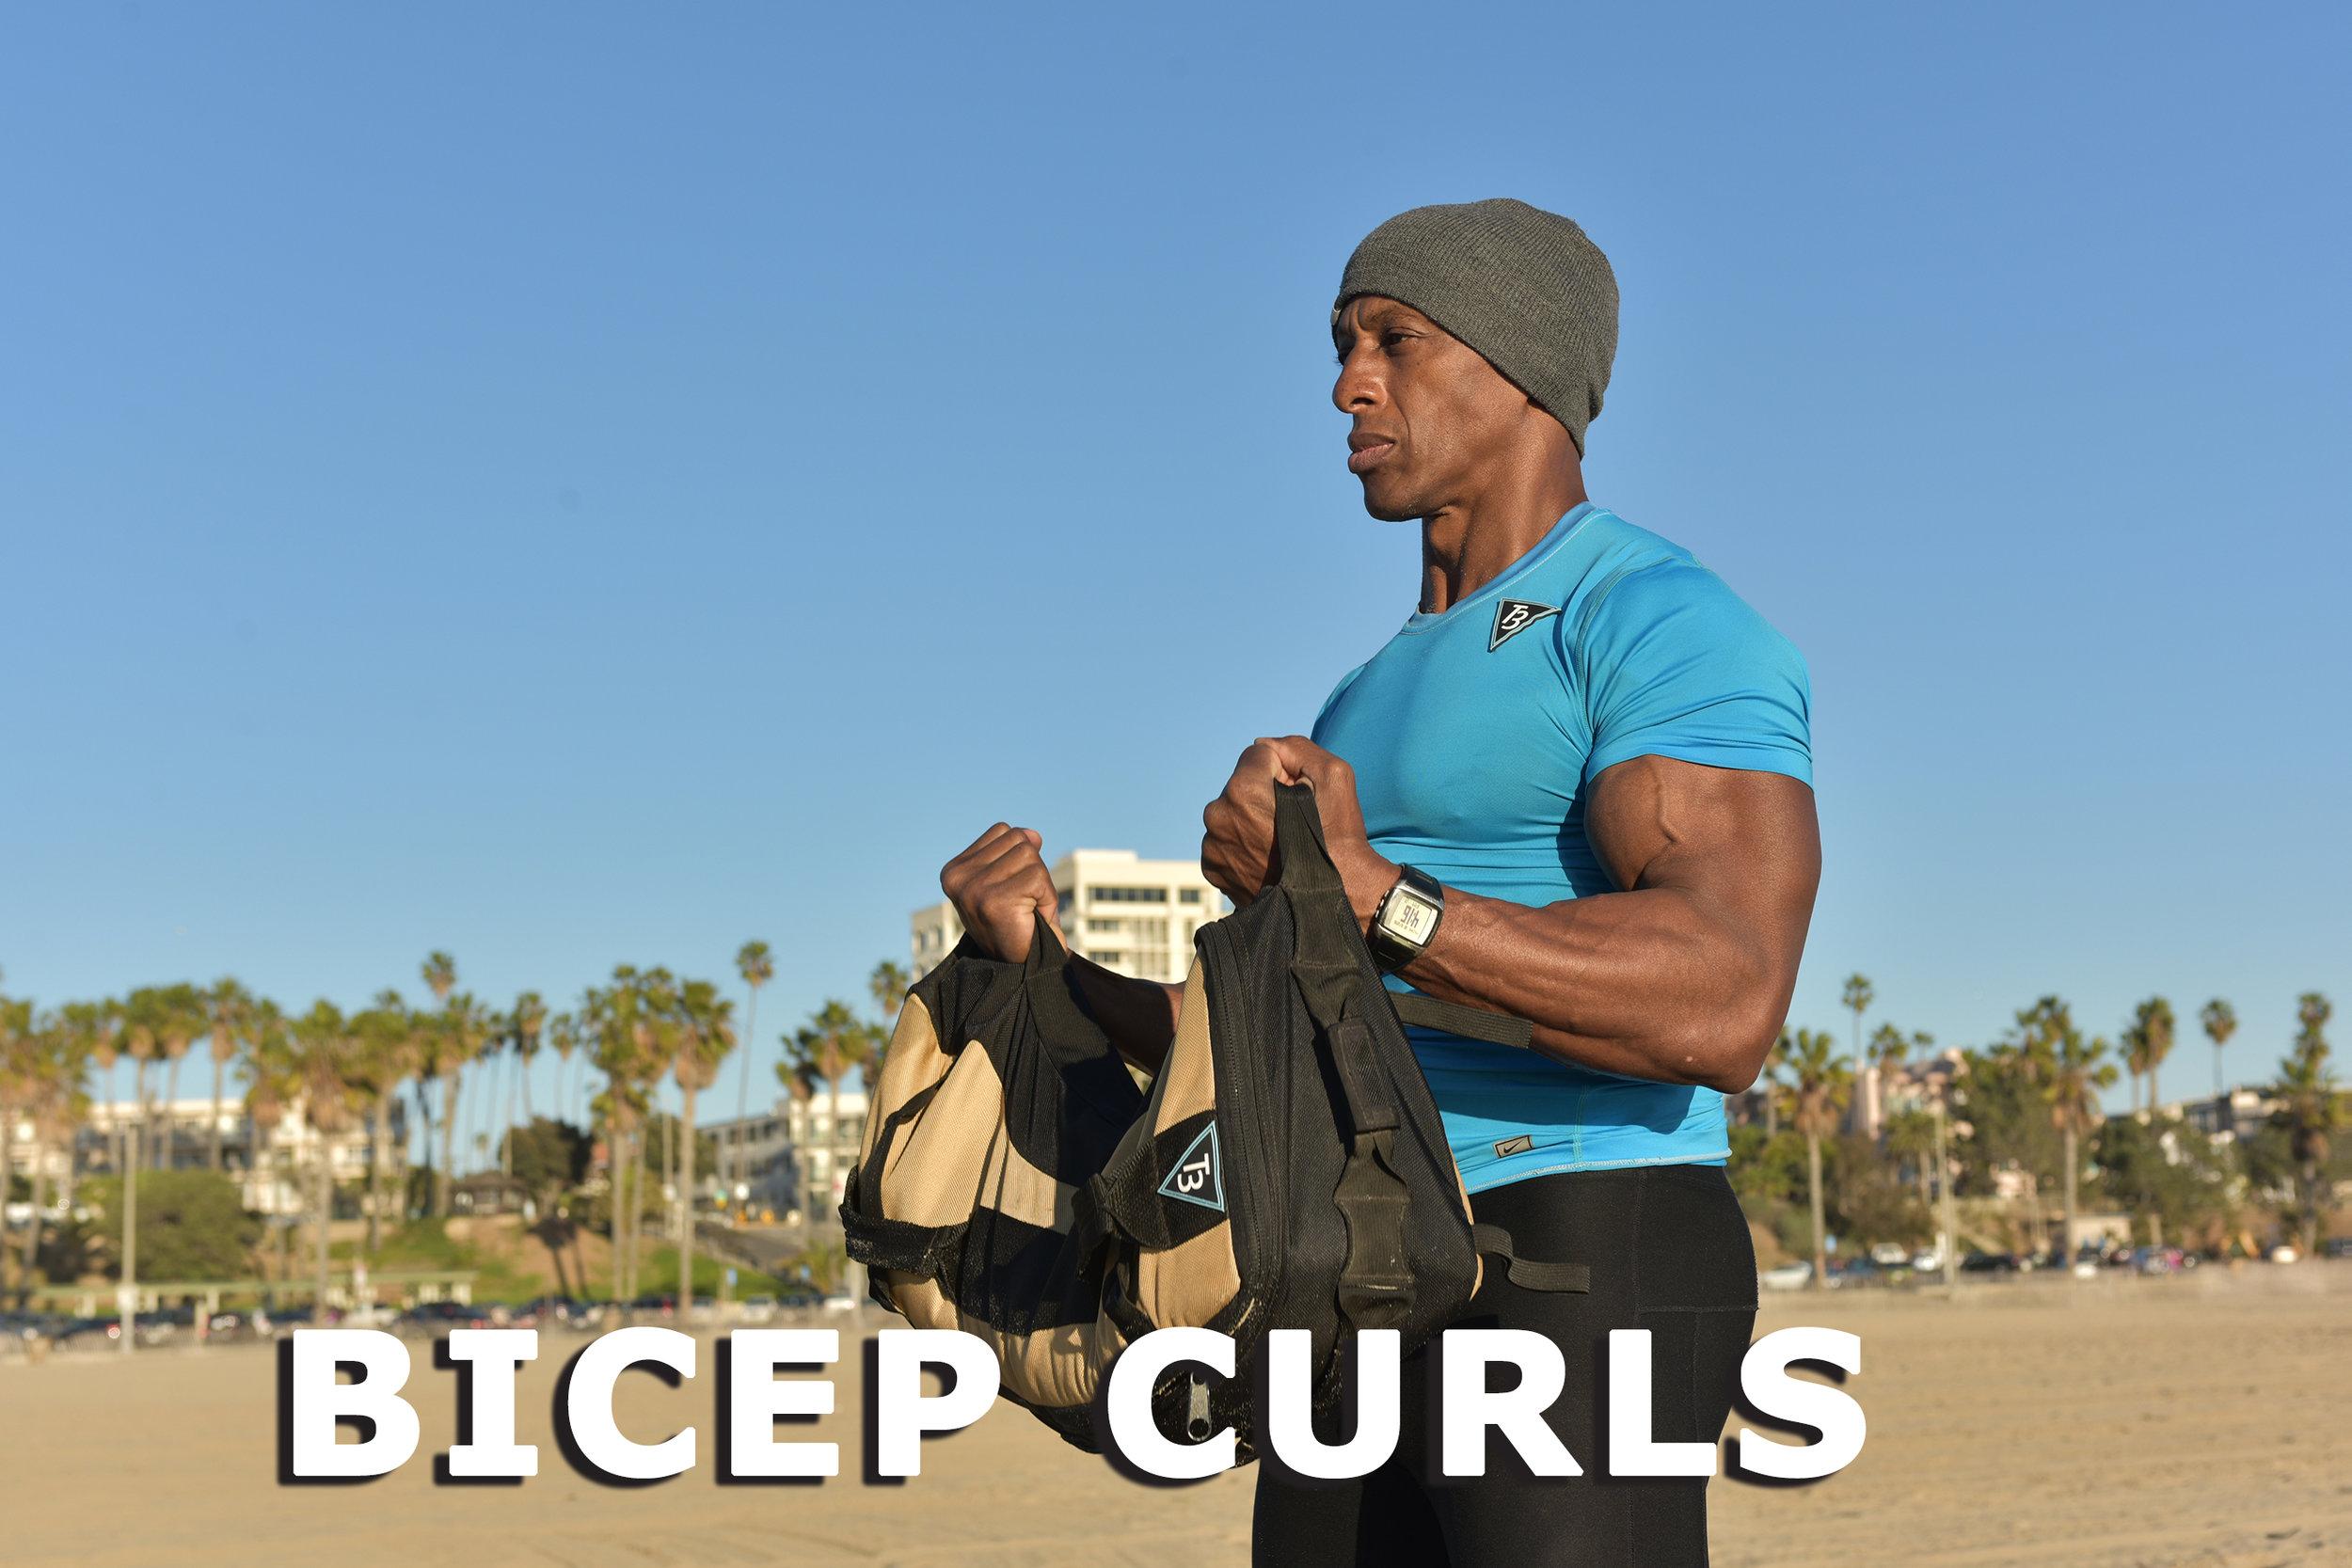 thomas_andrews- T3powerbag- personal trainer- fitness-bicepcurls.jpg